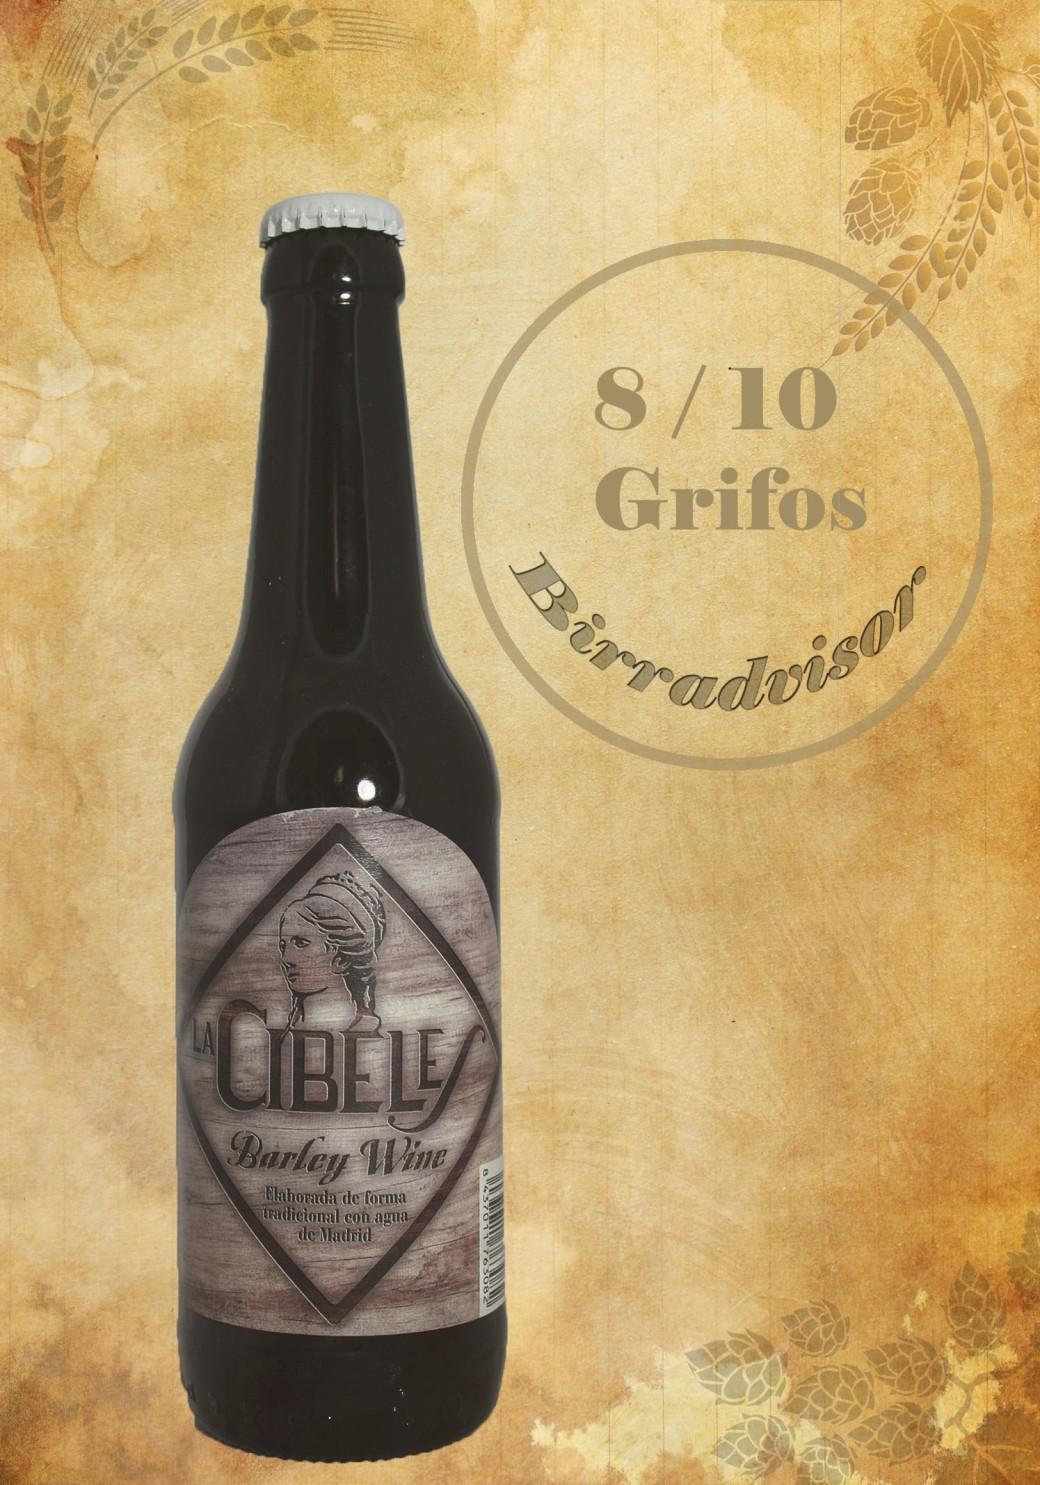 Cibeles (Barley Wine).jpg